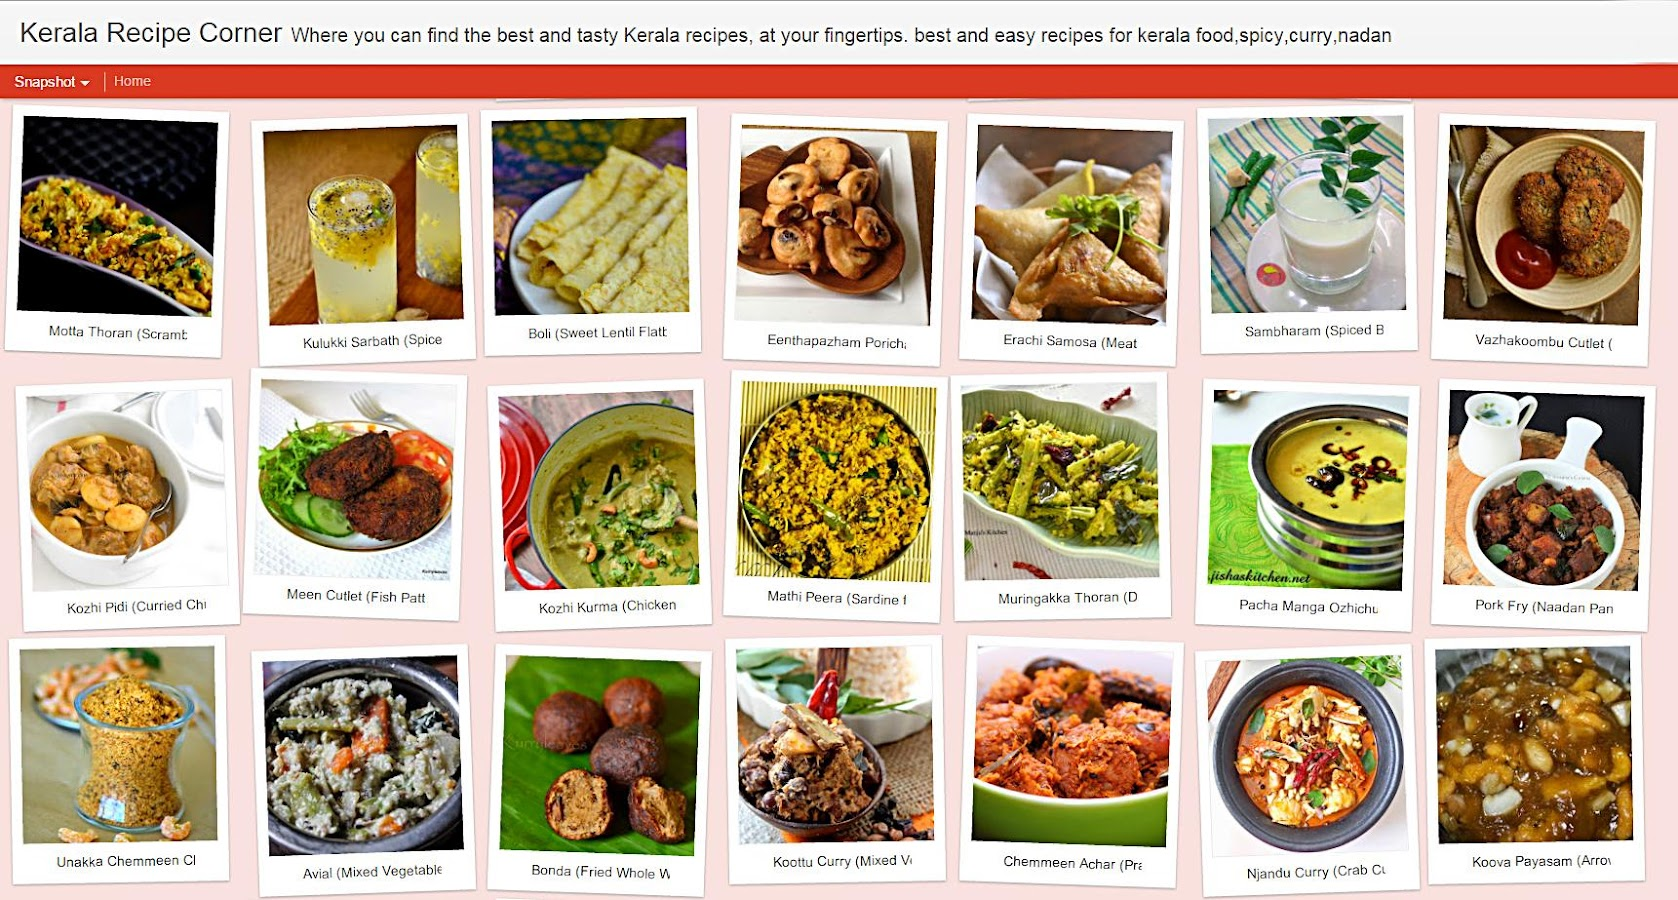 Kerala recipe corner android apps on google play kerala recipe corner screenshot forumfinder Gallery